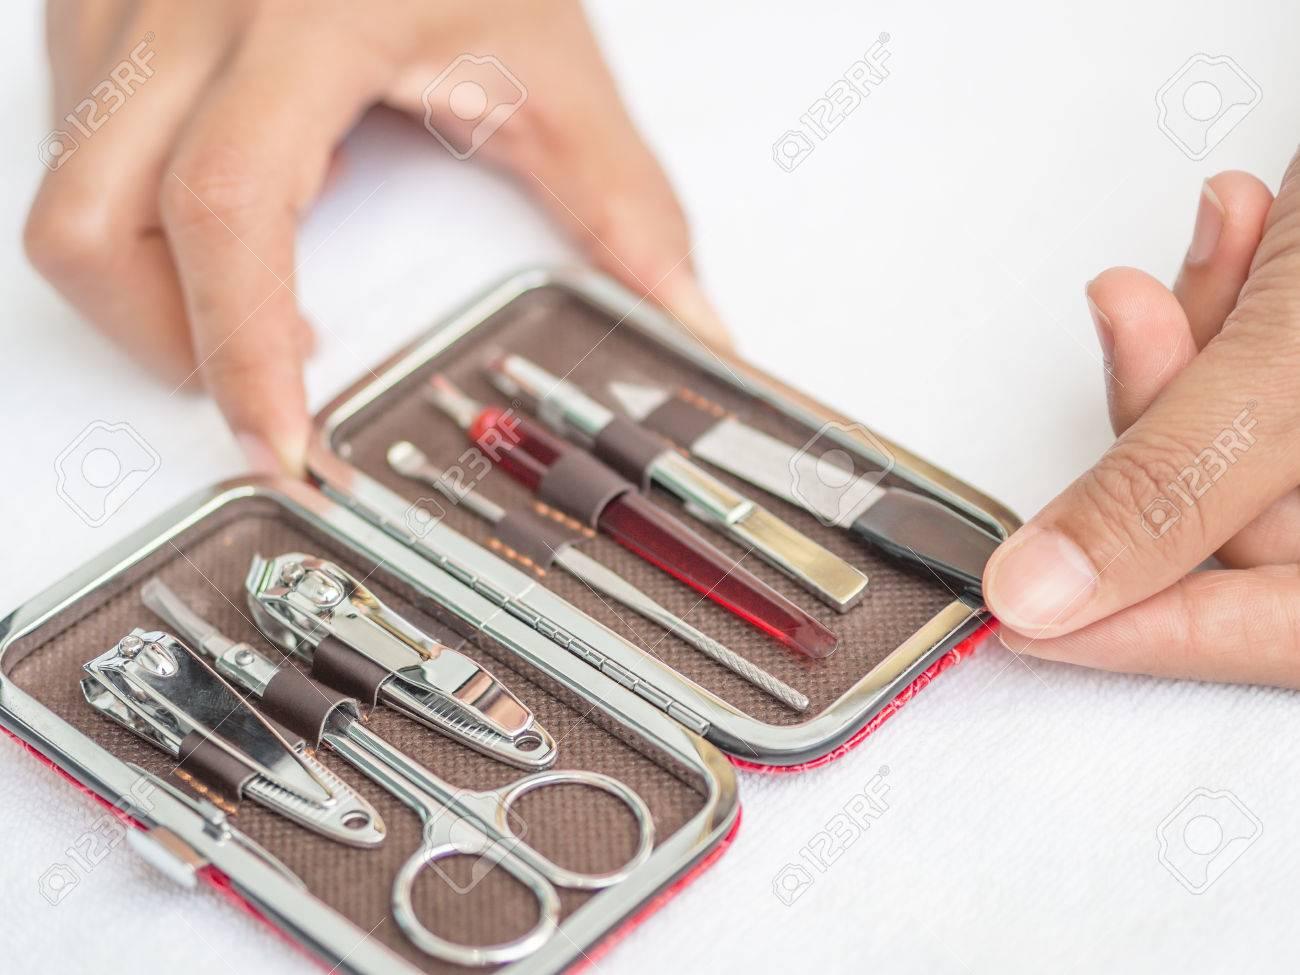 Closeup Woman Hand Holding Traveler\'s Nail Care Kit Of Necessary ...